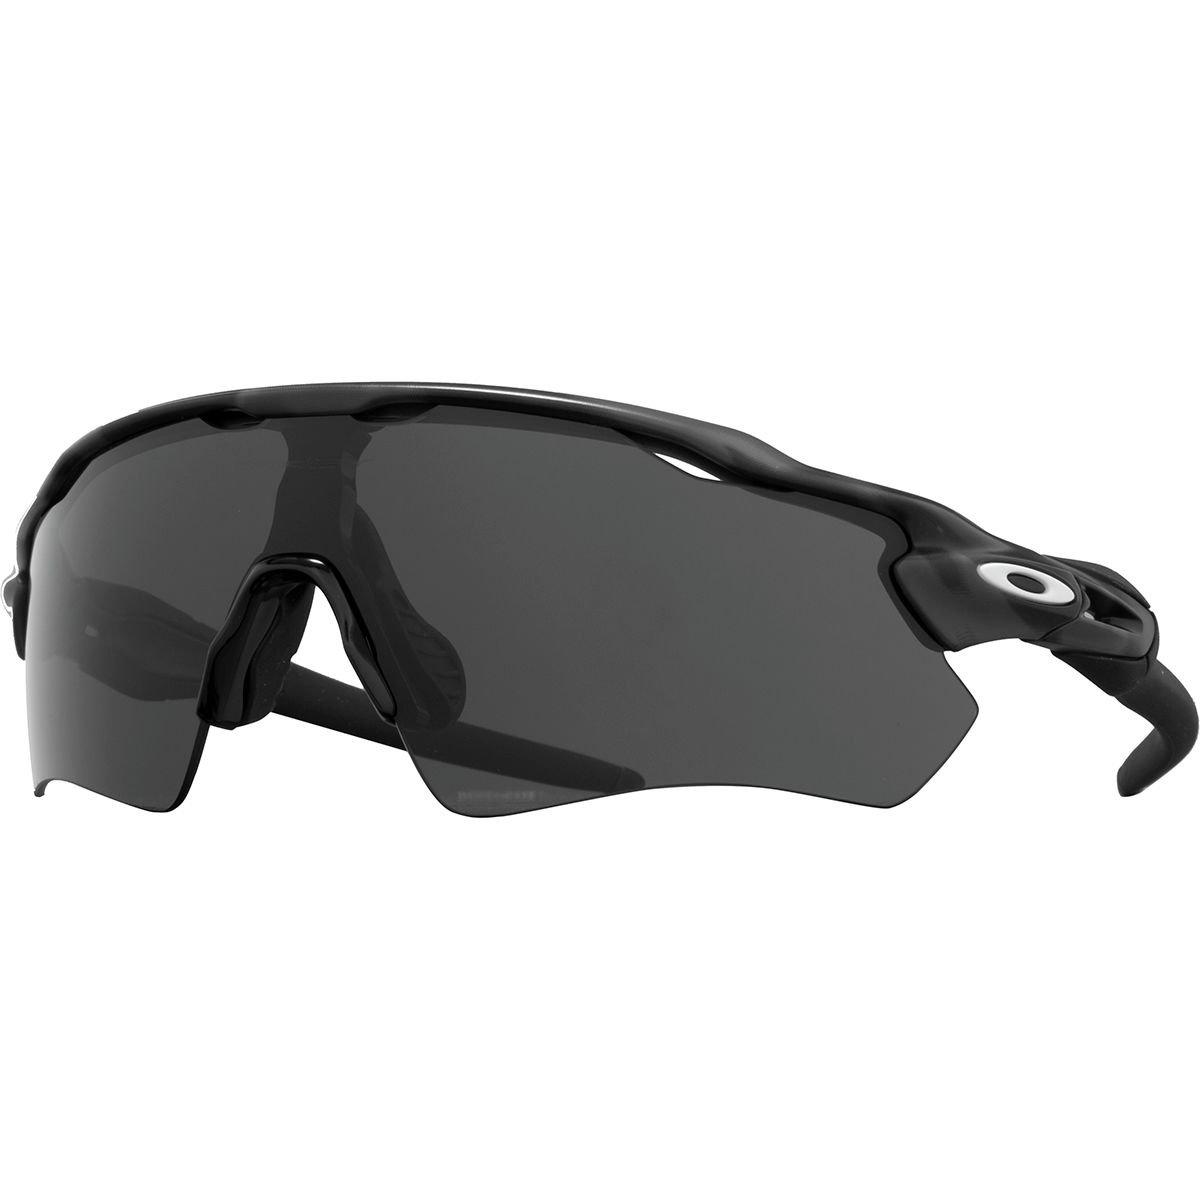 616c0ffdb8 Amazon.com  Oakley Men s MPH Radar EV Path Satine Green Camo Grey One Size   Clothing